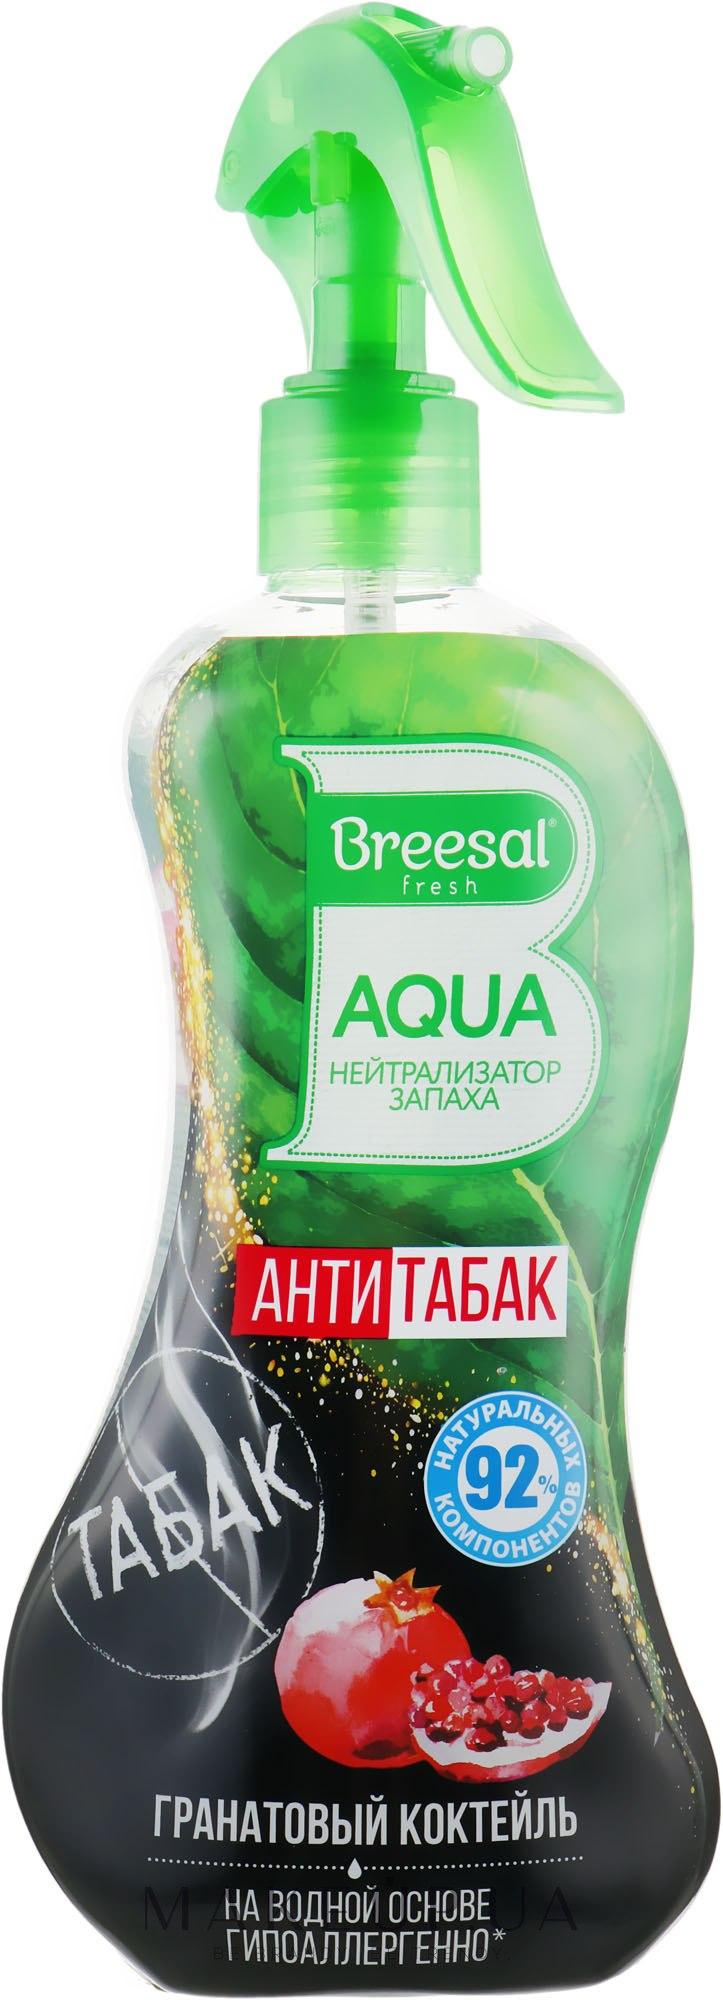 Купить Breesal Aqua-нейтрализатор запаха антитабак Гранатовый коктейль , 375 мл (Breesal, Нейтрализация запаха Breesal Fresh)